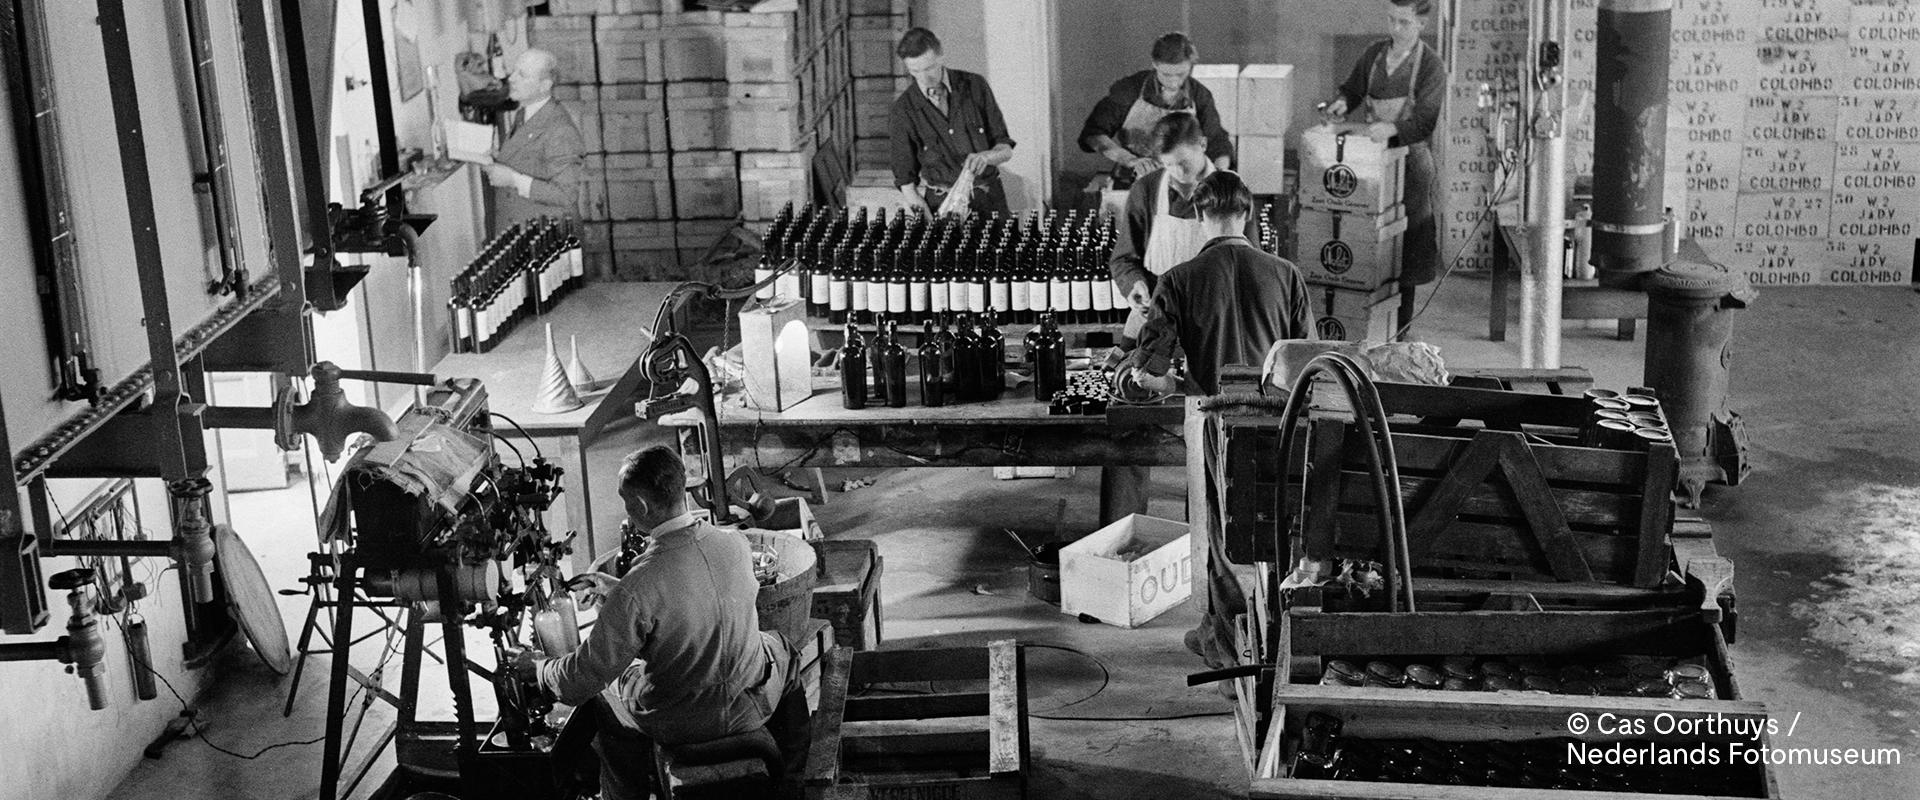 Familiebedrijf-cas-oorthuys-nolet-distillery-header